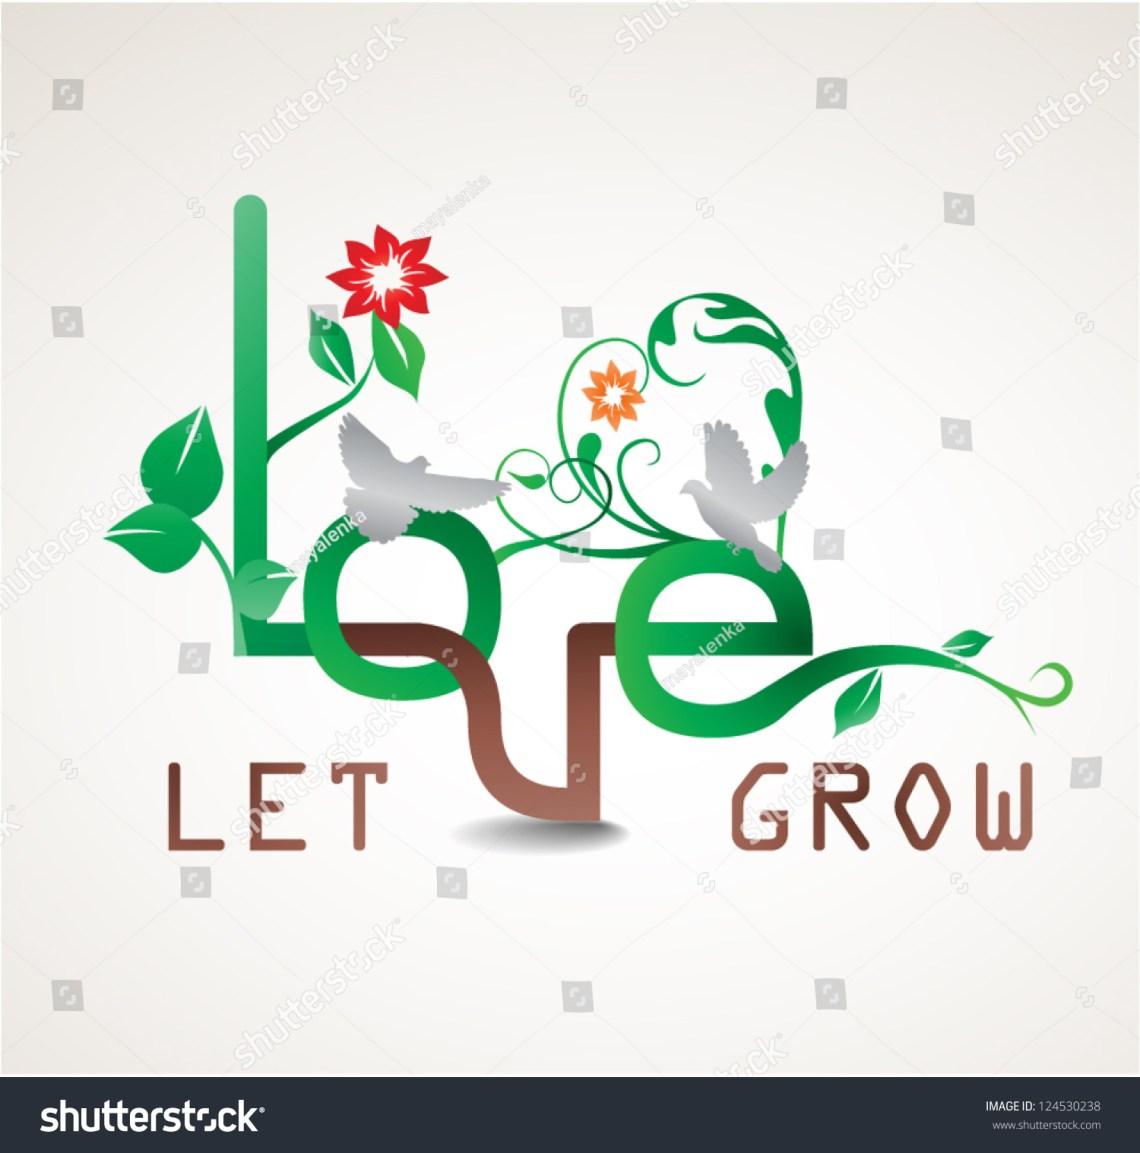 Download Let Love Grow Vector Illustration Stock Vector 124530238 ...